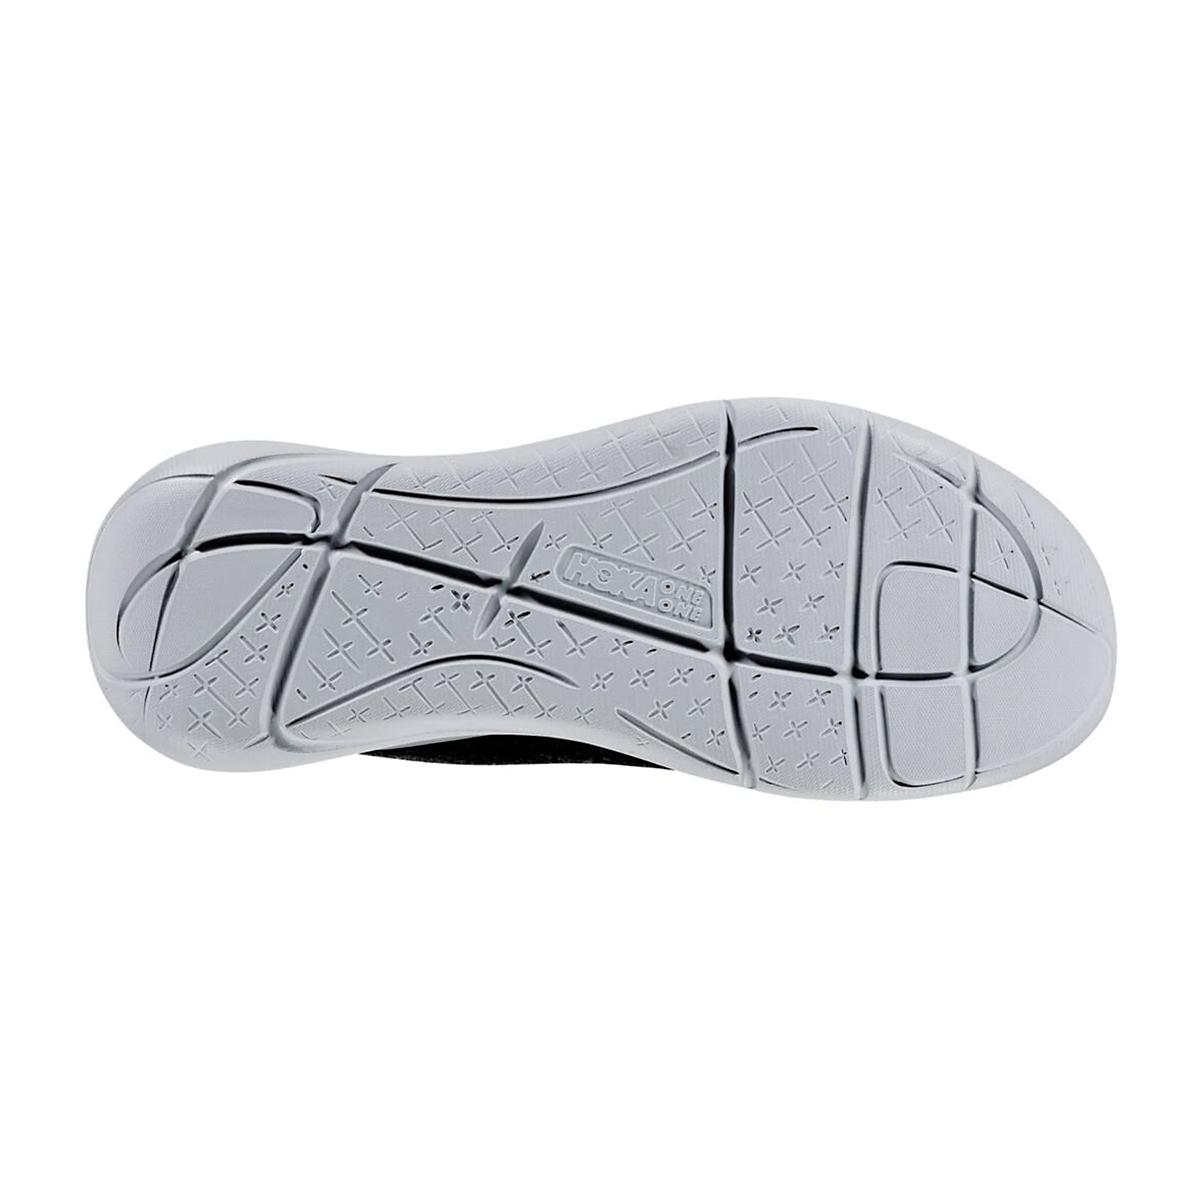 Women's Hoka One One Hupana Flow Wool Running Shoe - Color: Dark Shadow/Wild Dove - Size: 5 - Width: Regular, Dark Shadow/Wild Dove, large, image 4